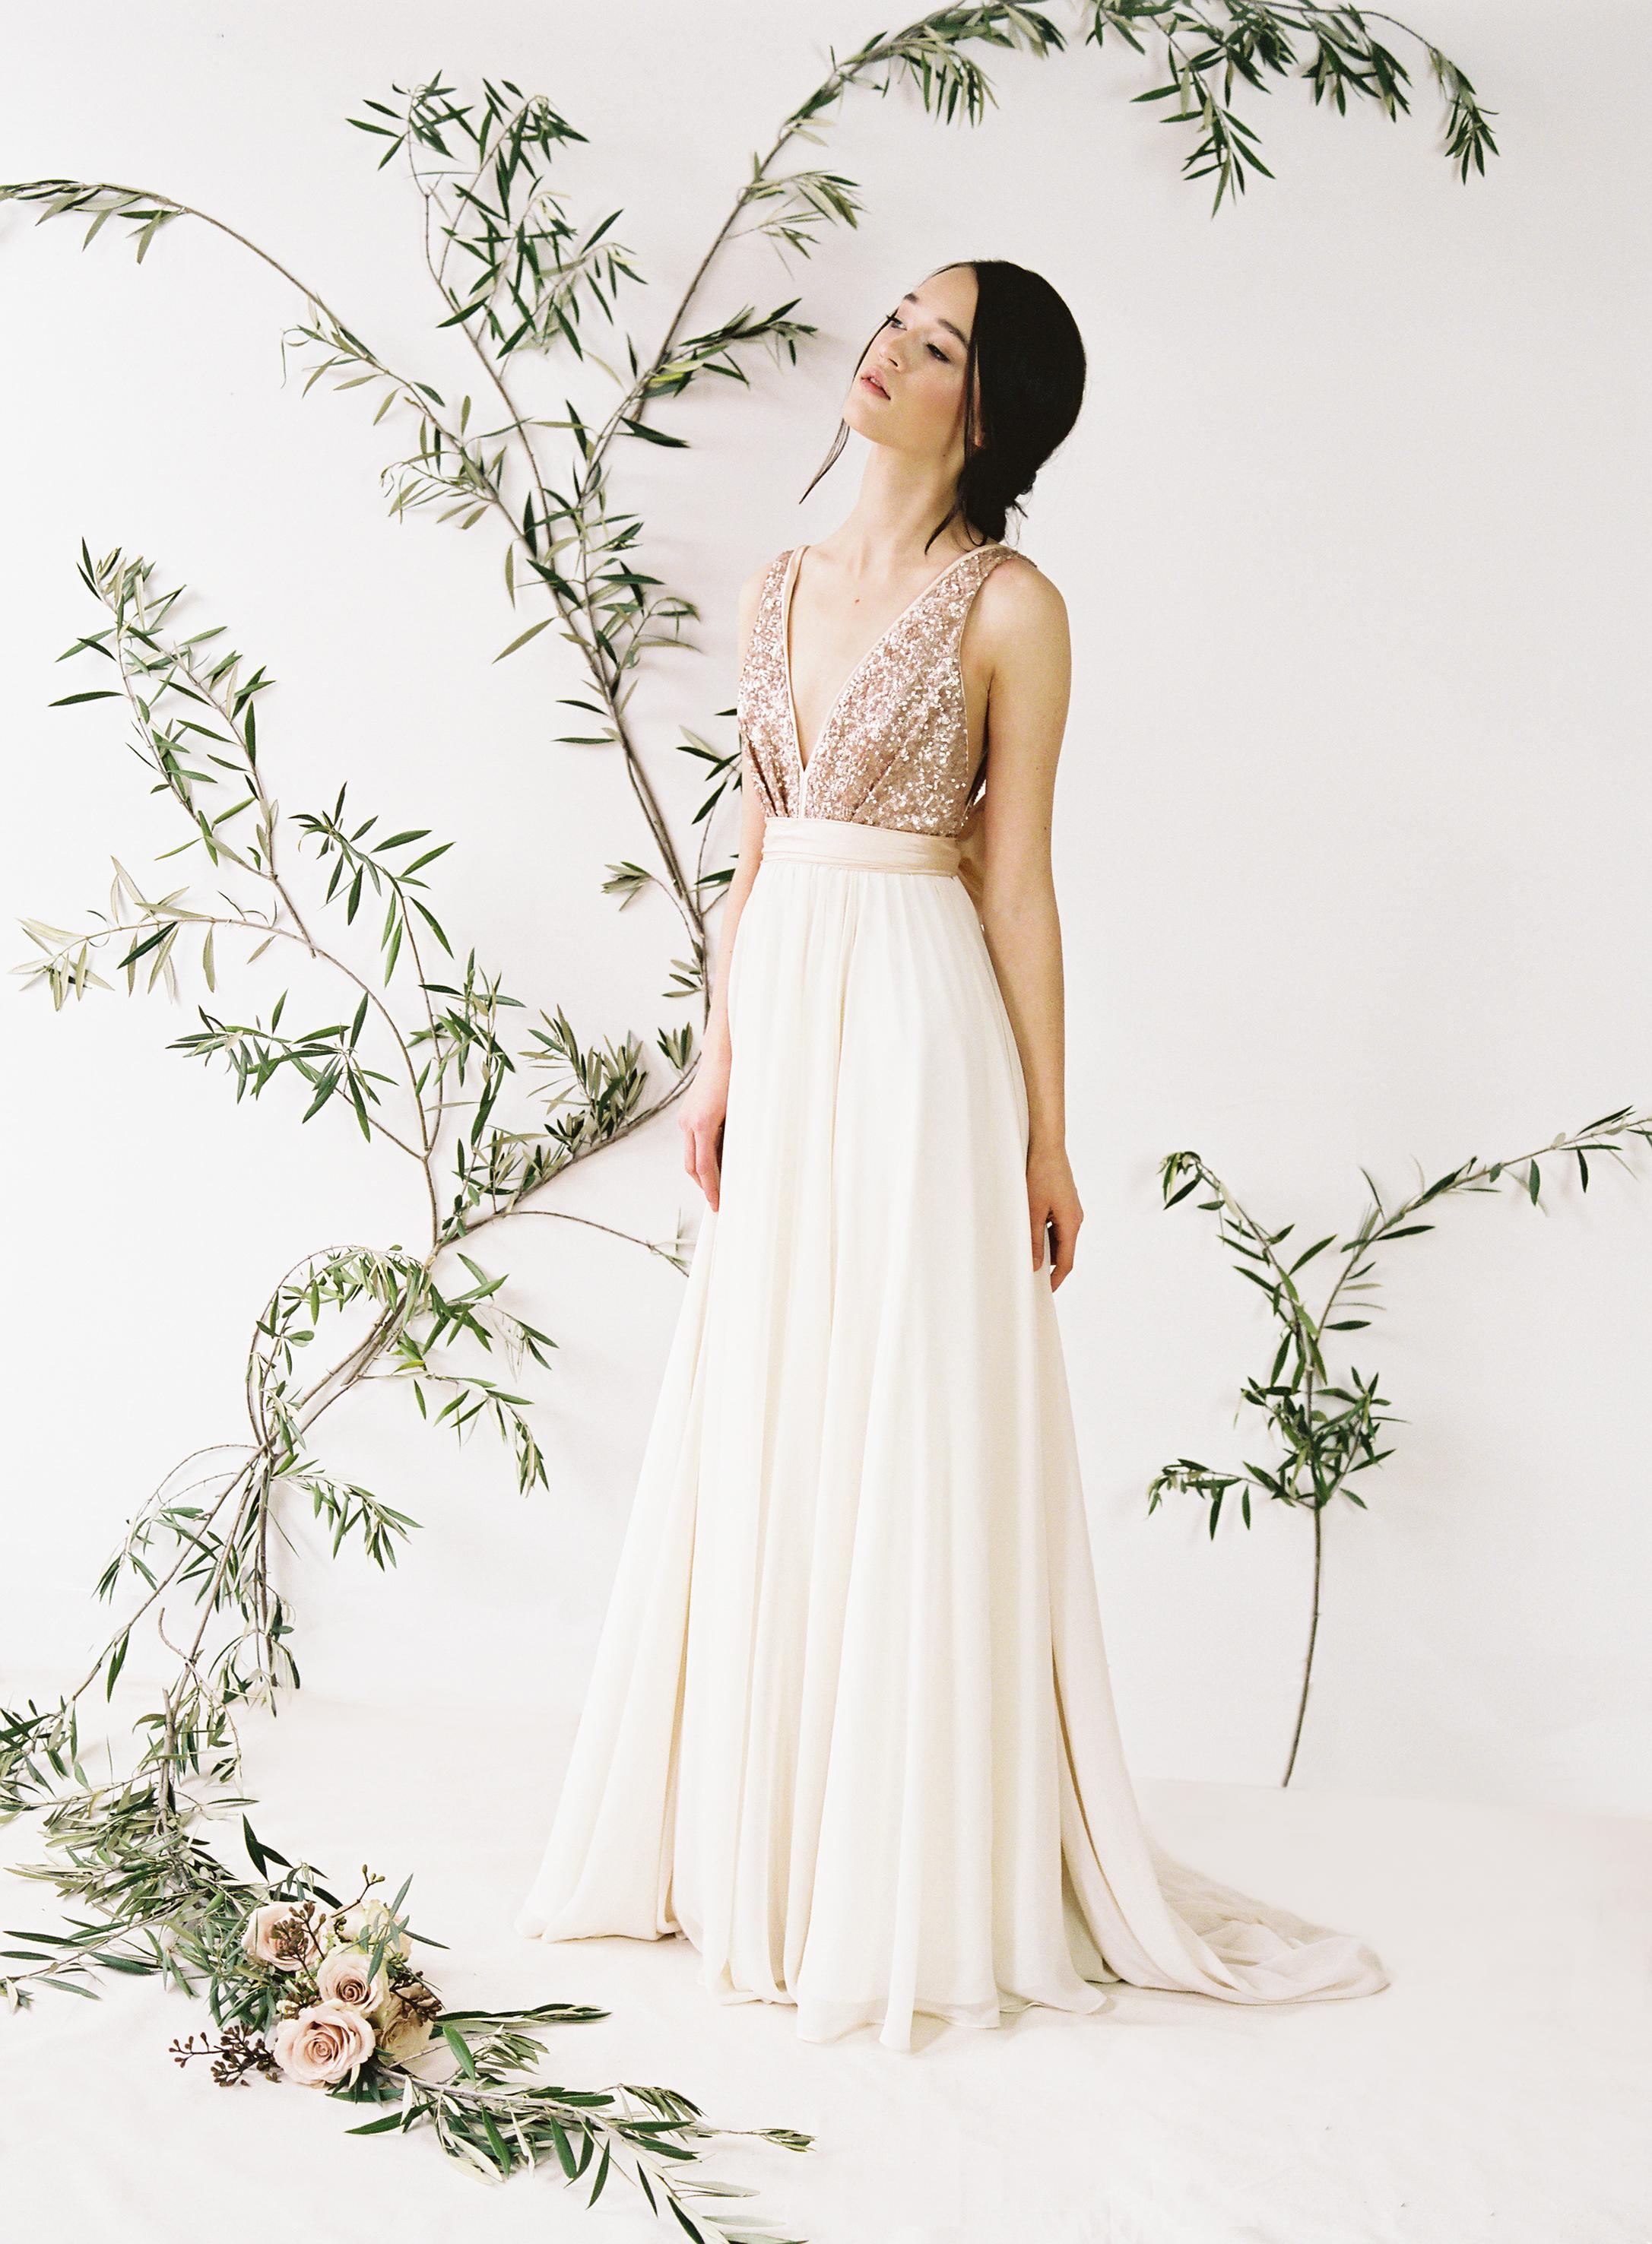 Eden wedding dress by Truvelle